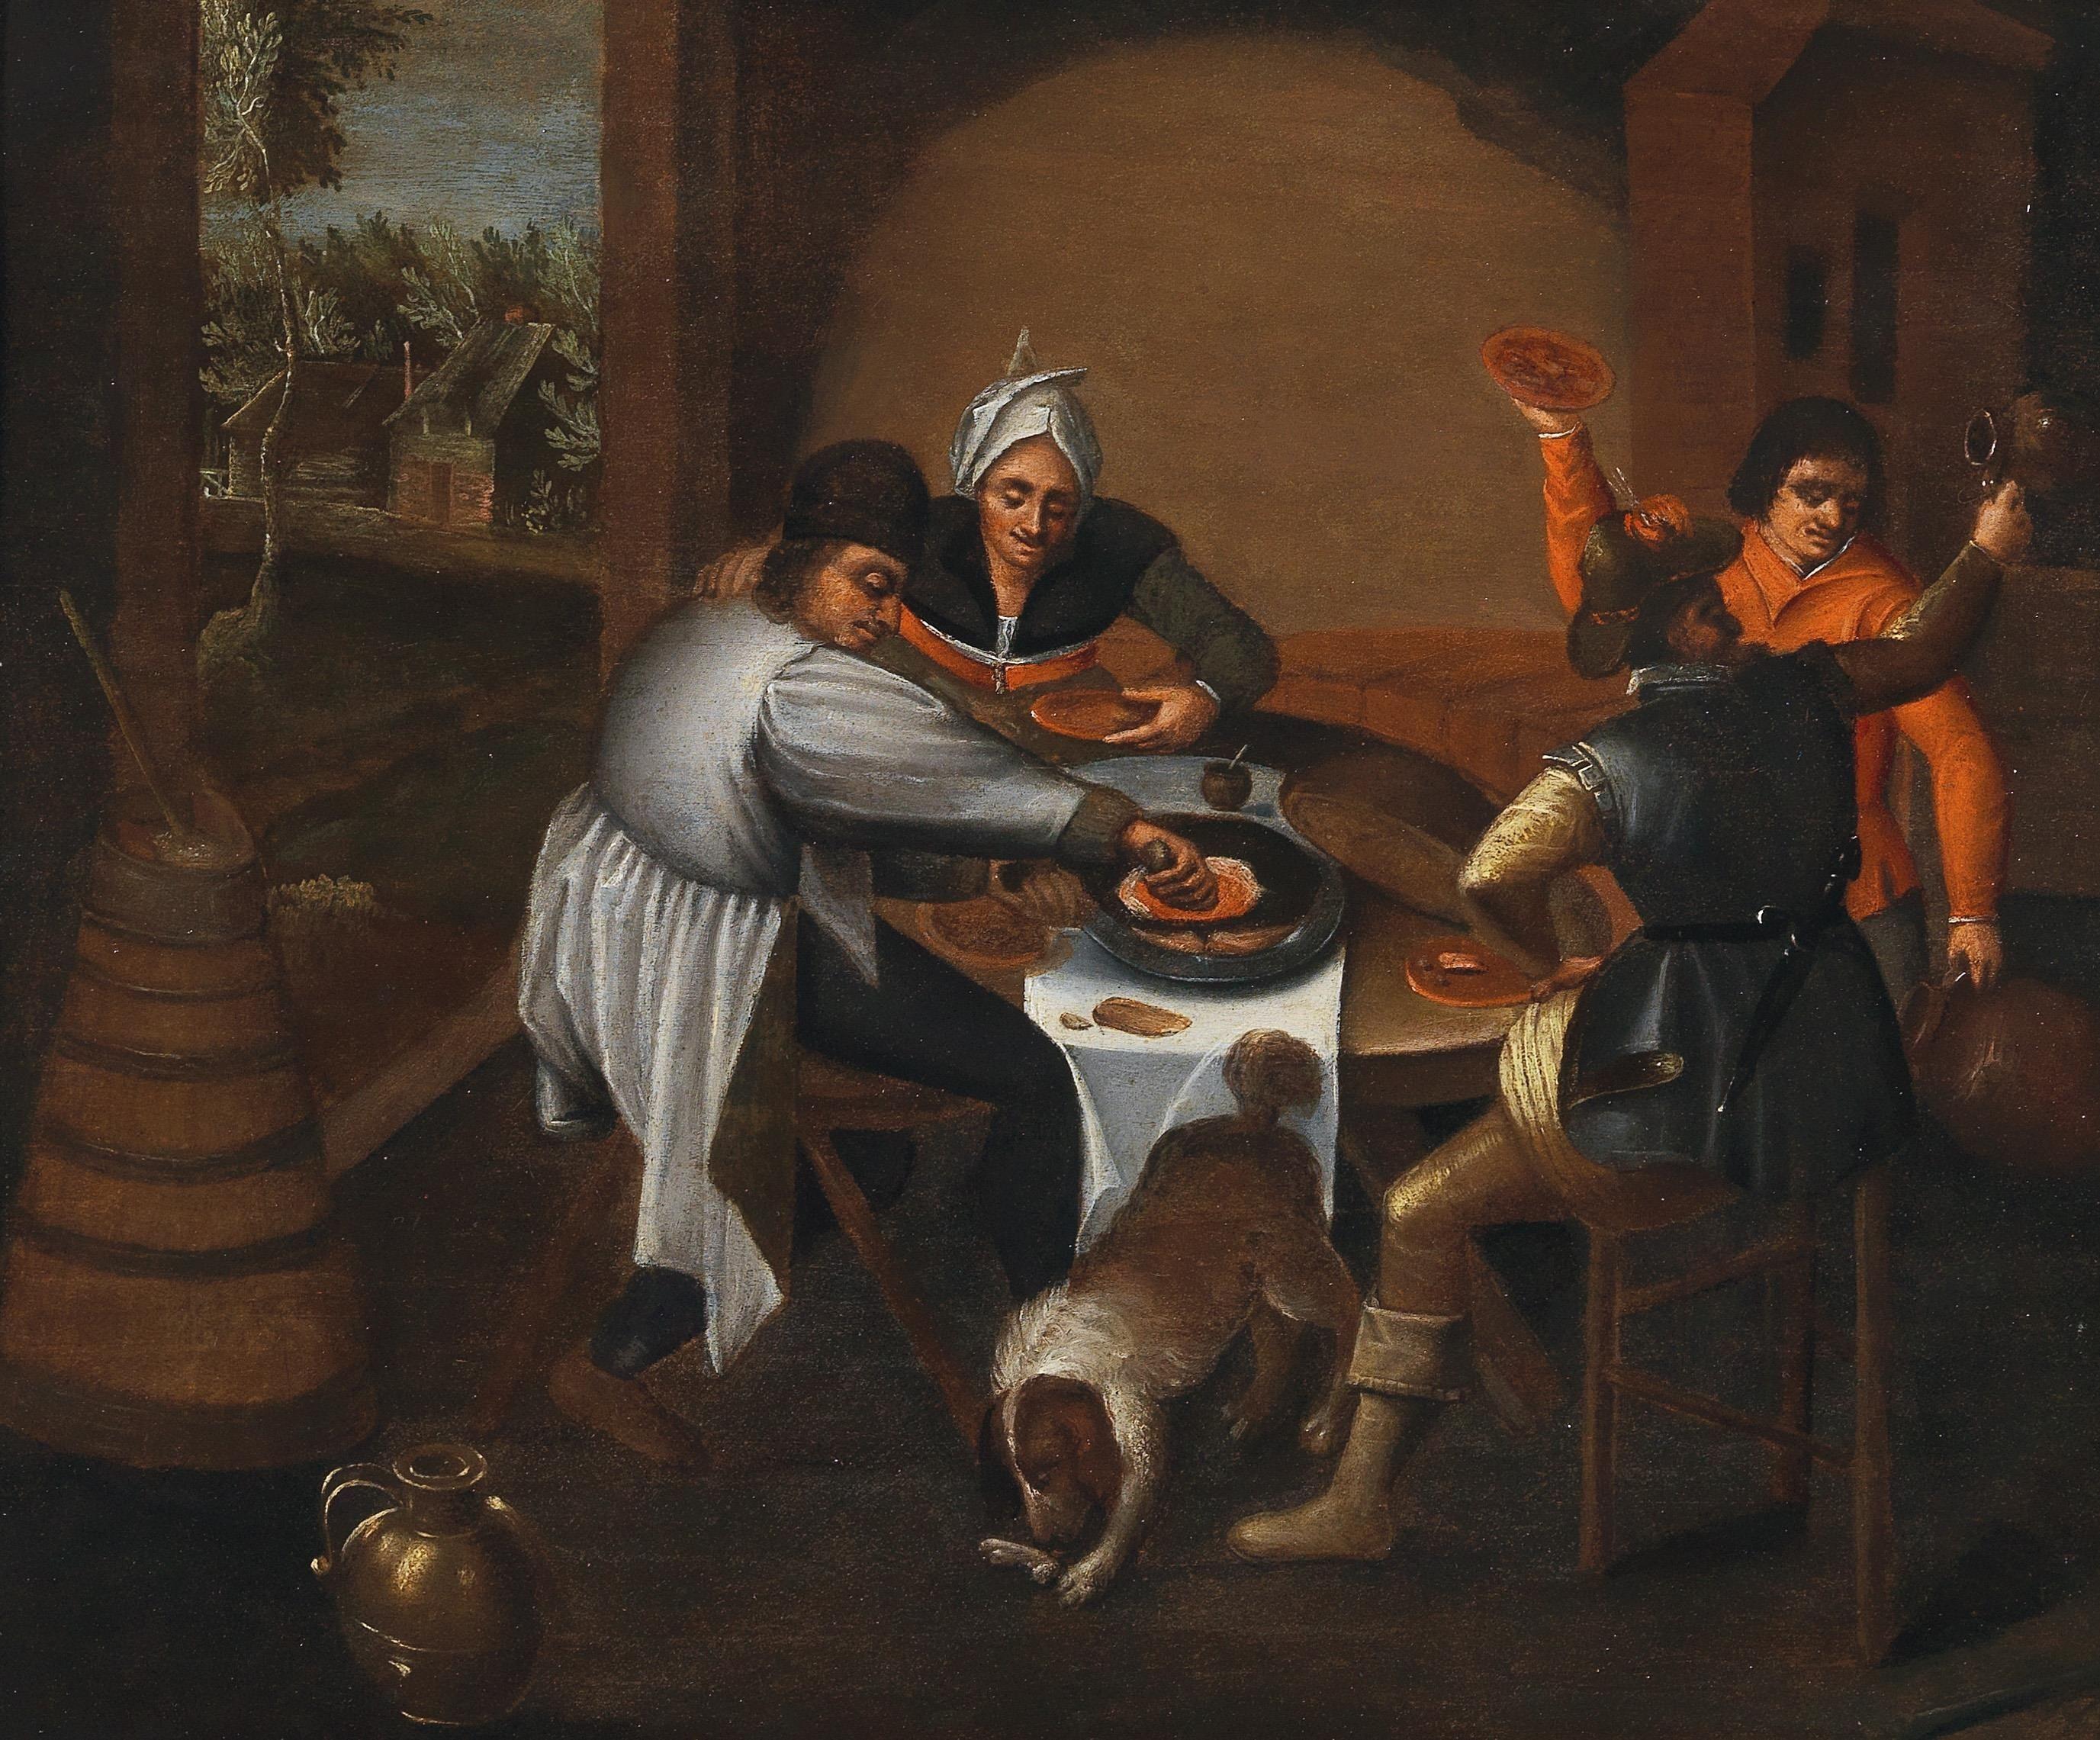 Marten van Cleve I (Dutch, 1527 - 1581) | Art, Painting, Art ...